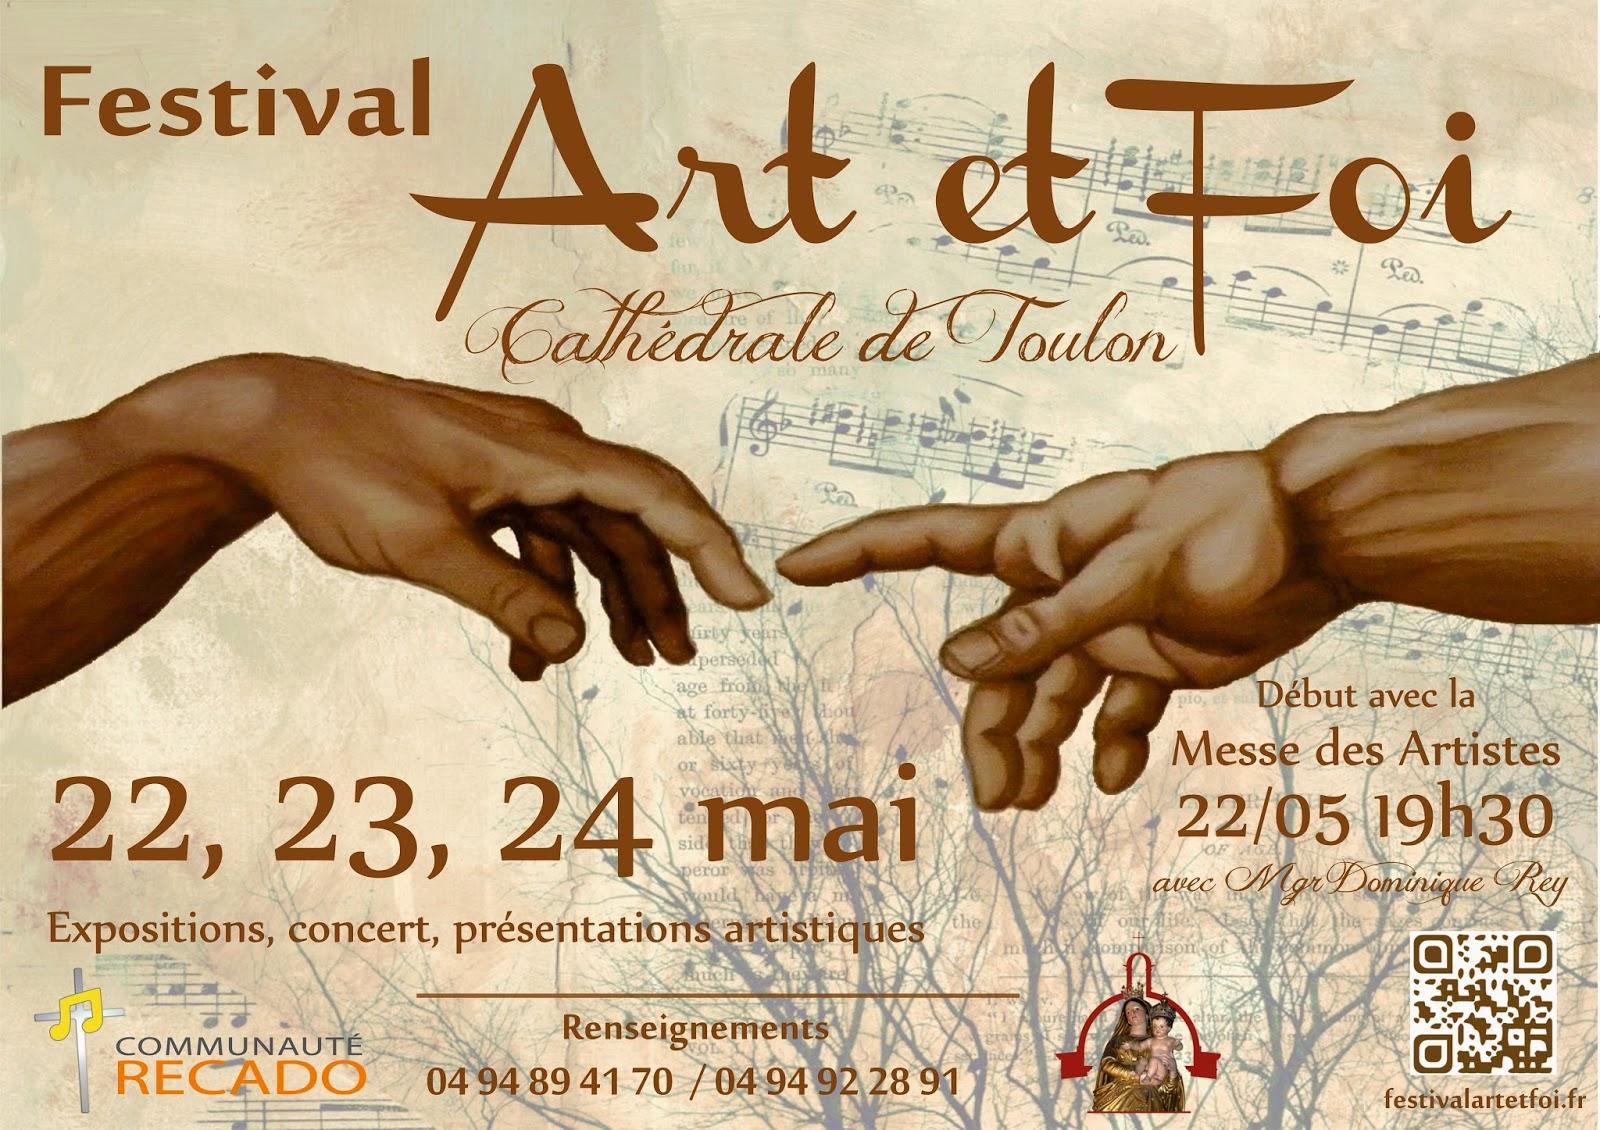 http://festivalartetfoi.fr/